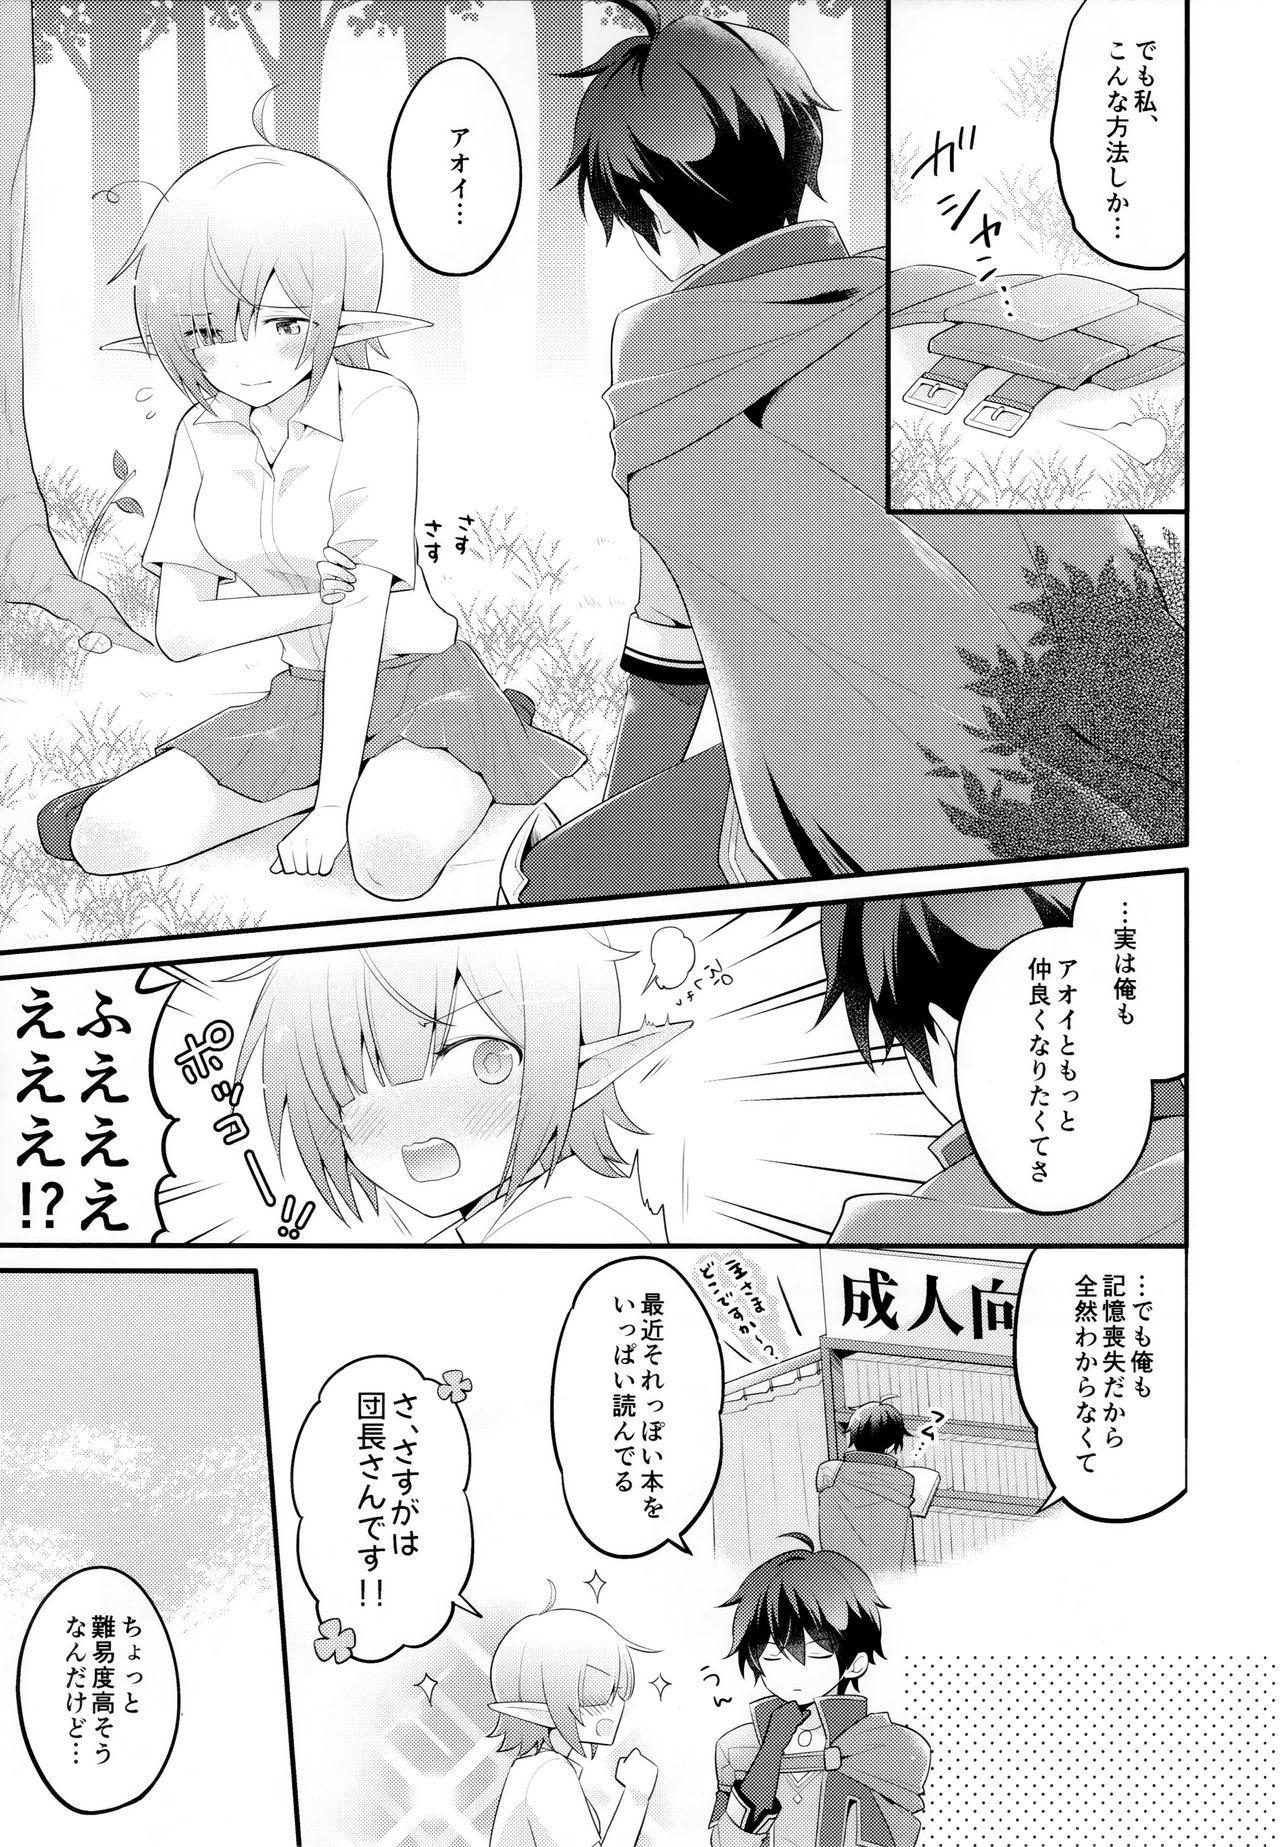 Aoi no Motto Otomodachi Daisakusen 11